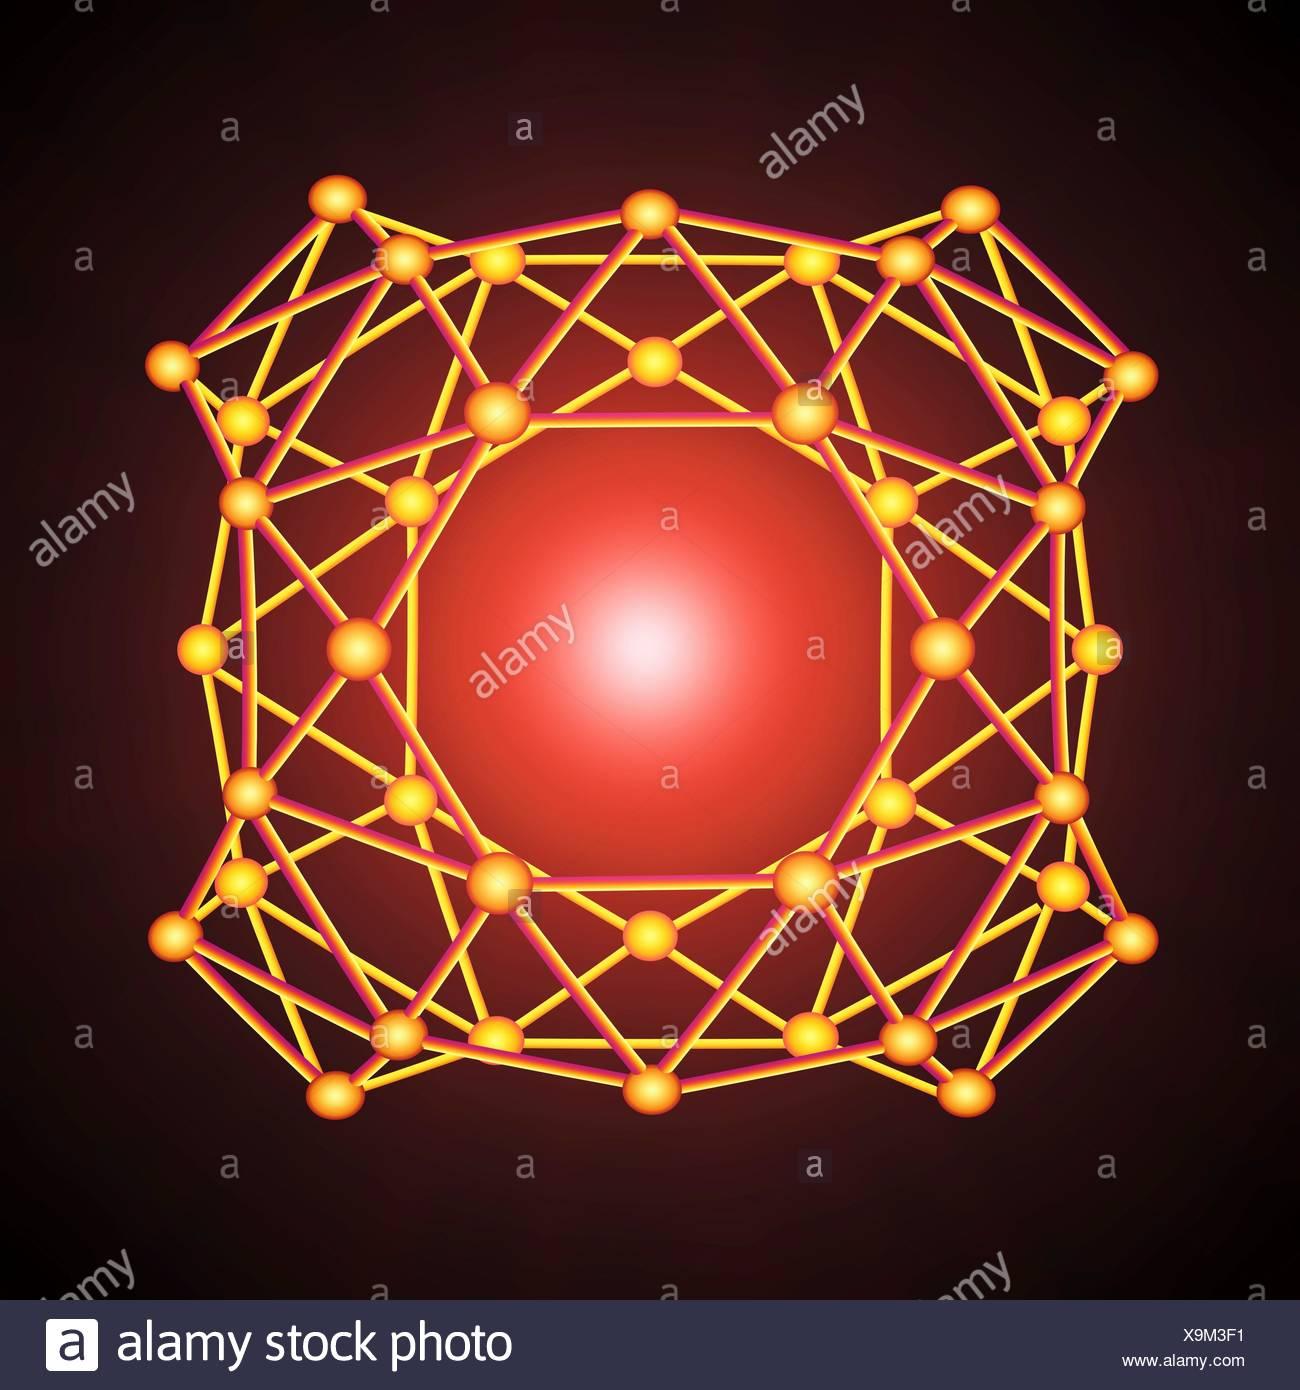 orbital diagram for beryllium kwikee electric step wiring boron atomic structure stock photos